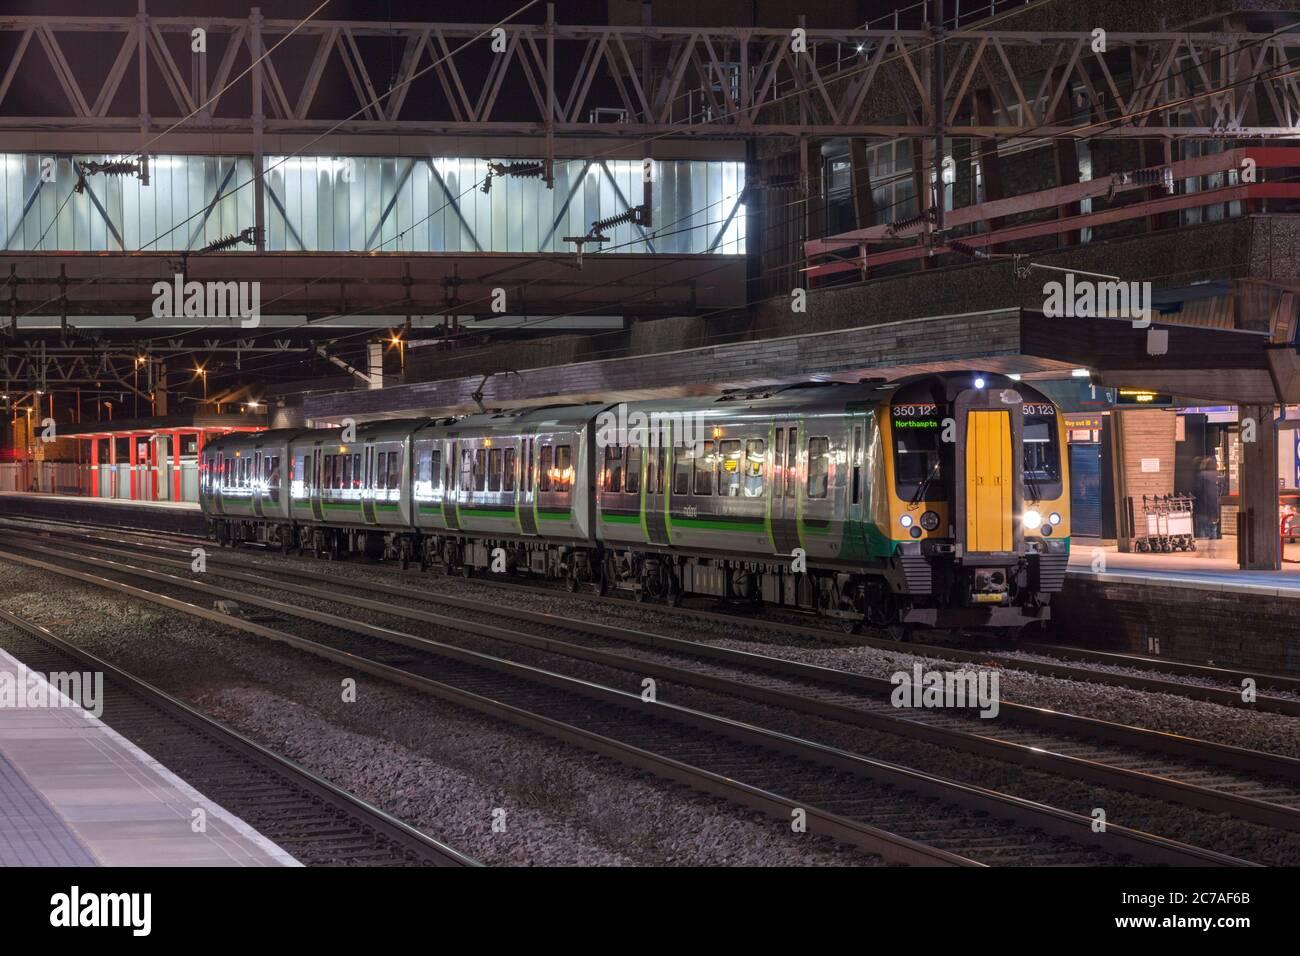 London Midland Siemens Desiro class 350 electric multiple unit train 350123 at Stafford railway station Stock Photo